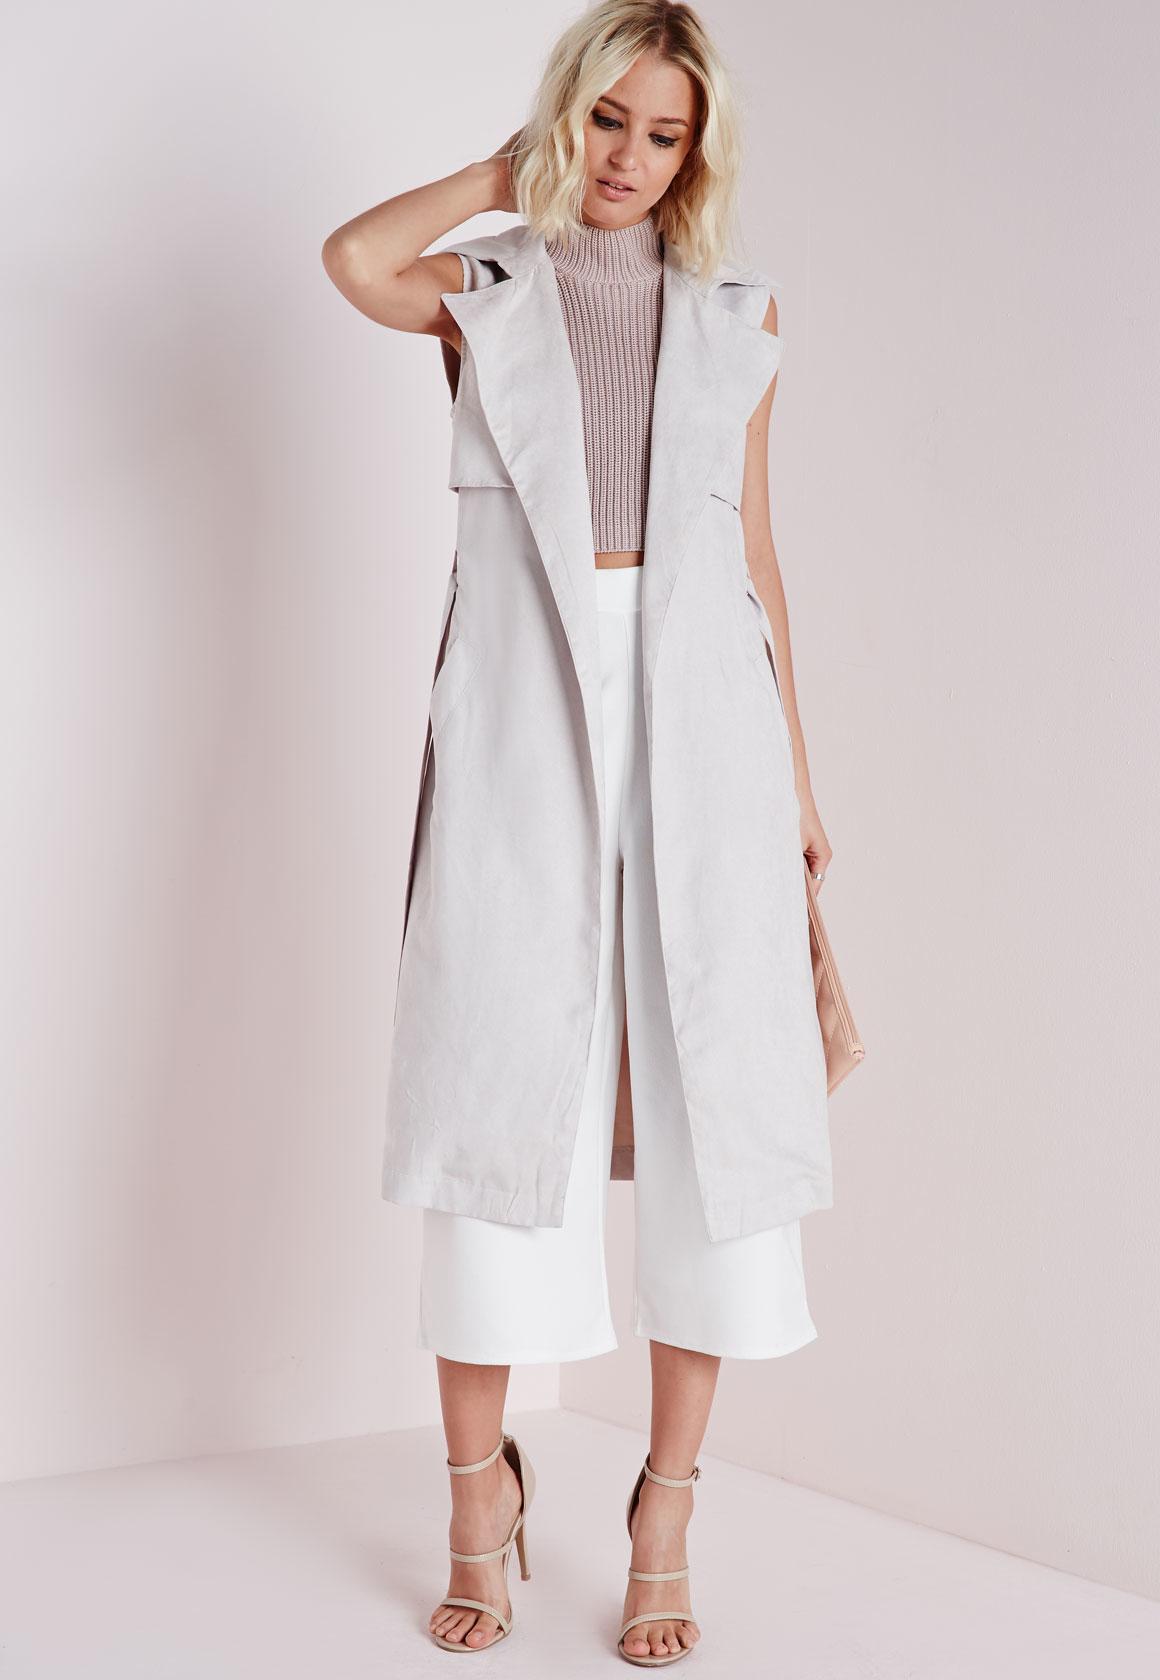 Long Grey Trench Coat | Light Pink Trench Coat | Sleeveless Trench Coat